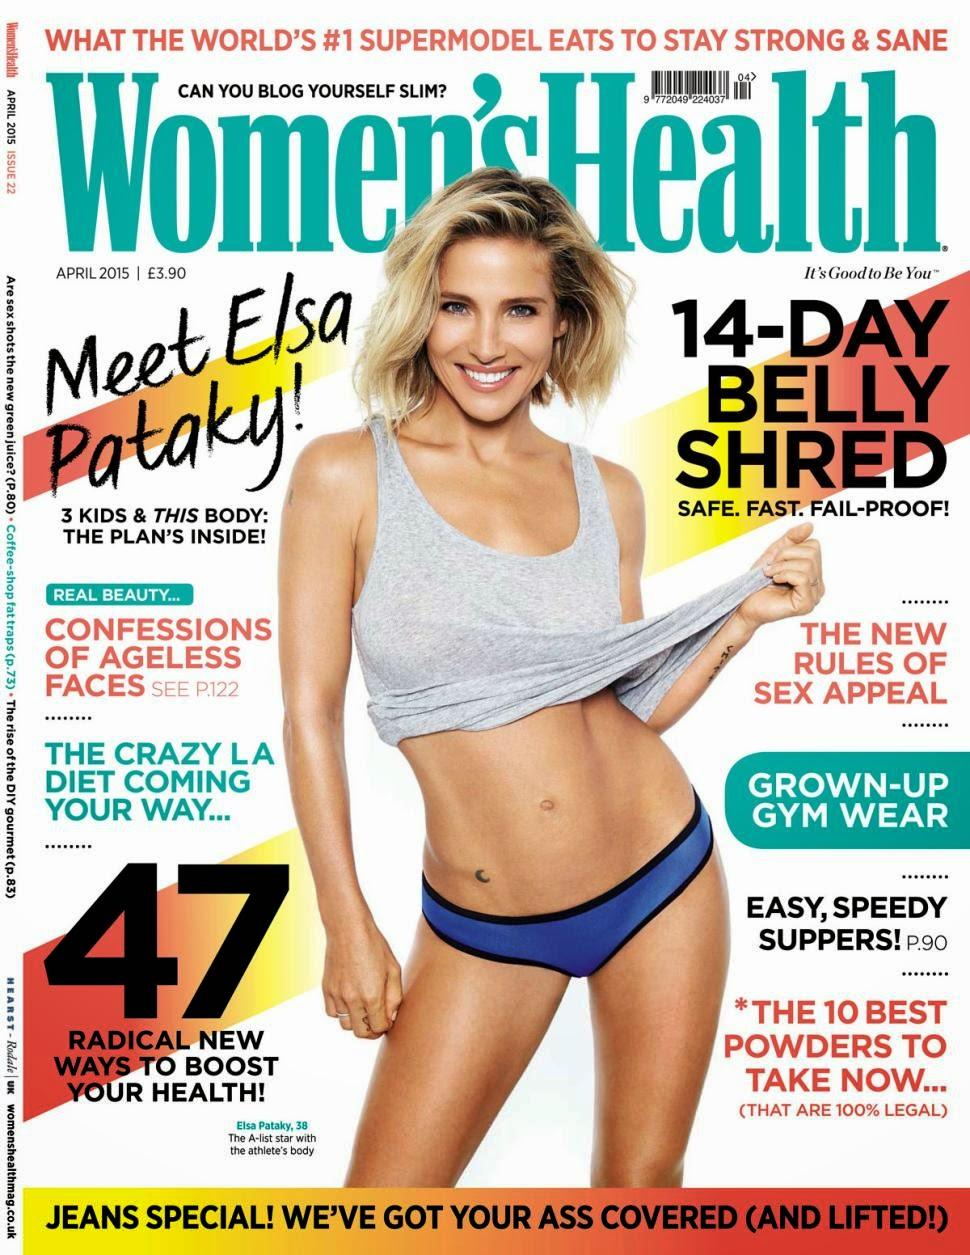 Model, Actress @ Elsa Pataky - Women's Health UK, April 2015